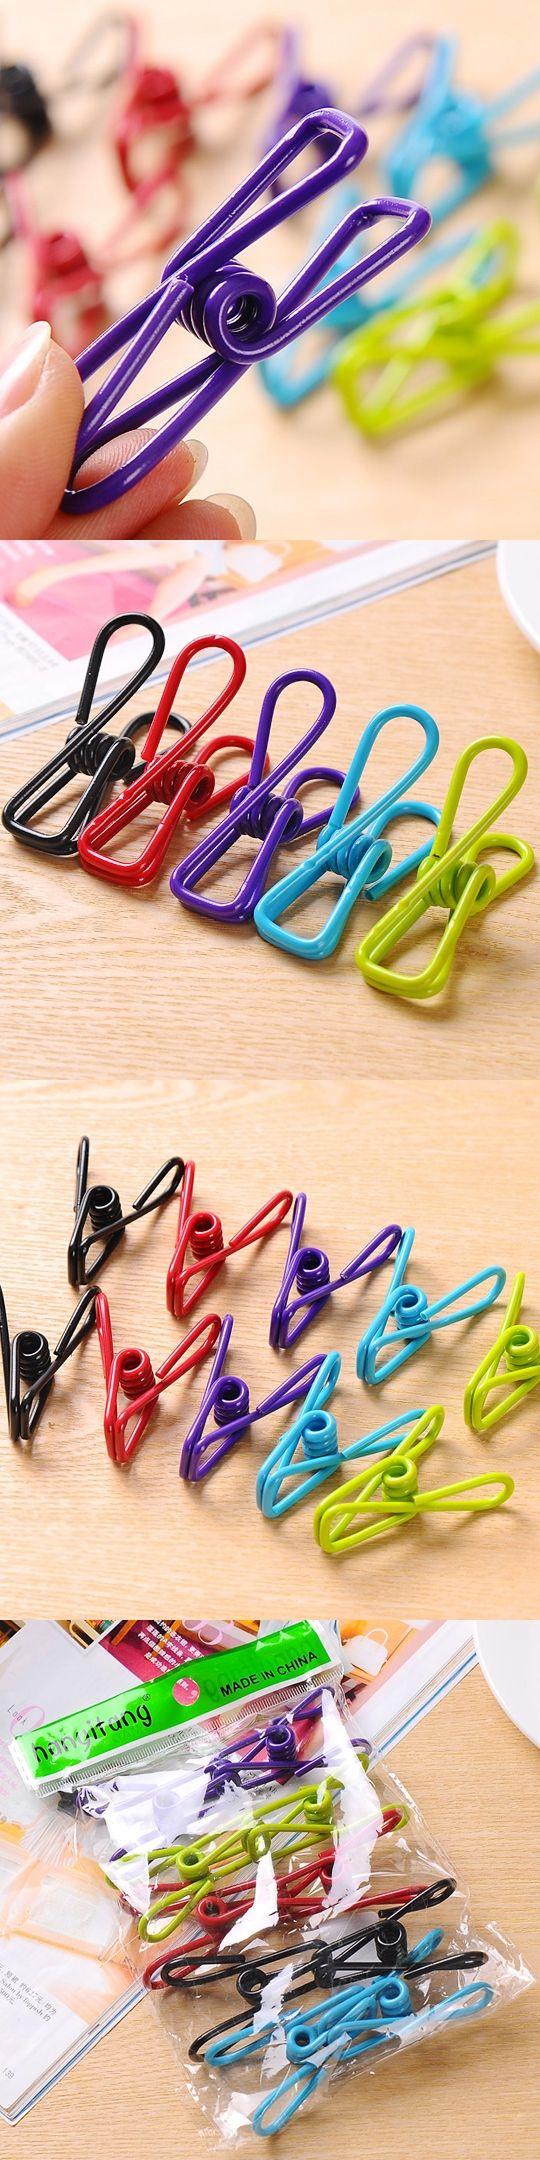 10pcs/set Mini Multi-color Small Clip Creative Photo Clip Hanger Clip Towel Clips